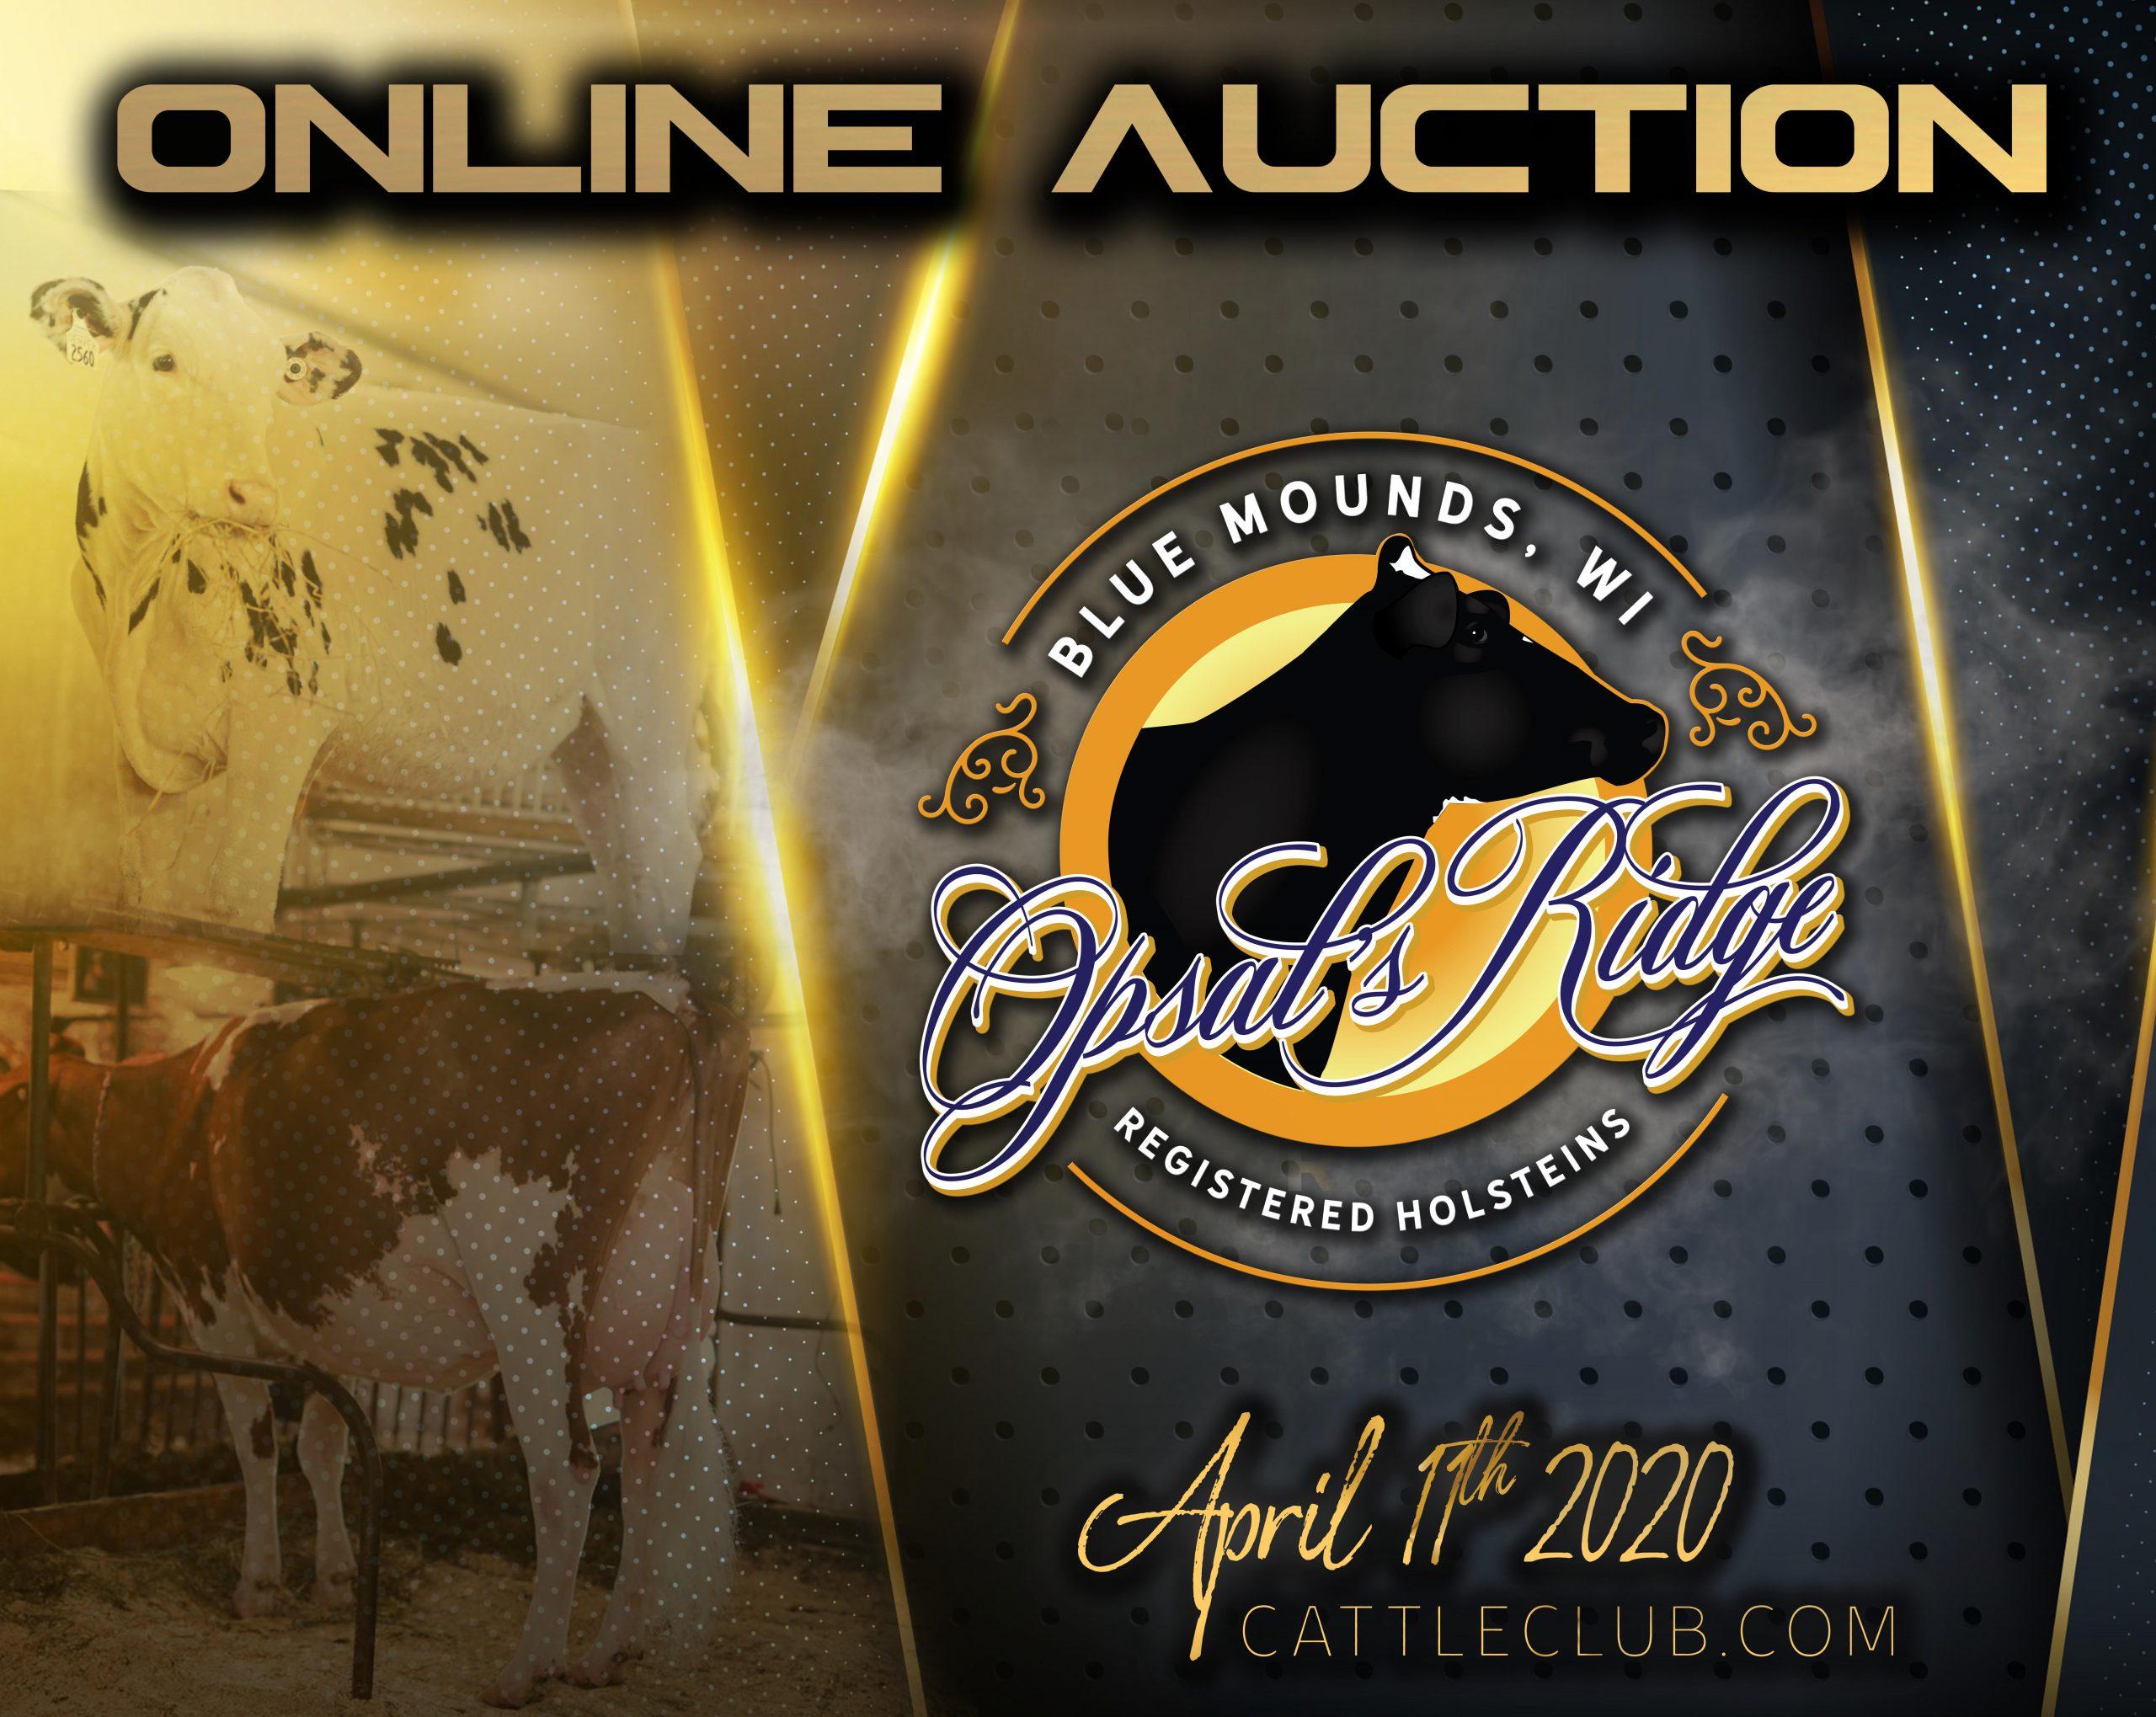 Opsal's Ridge Auction